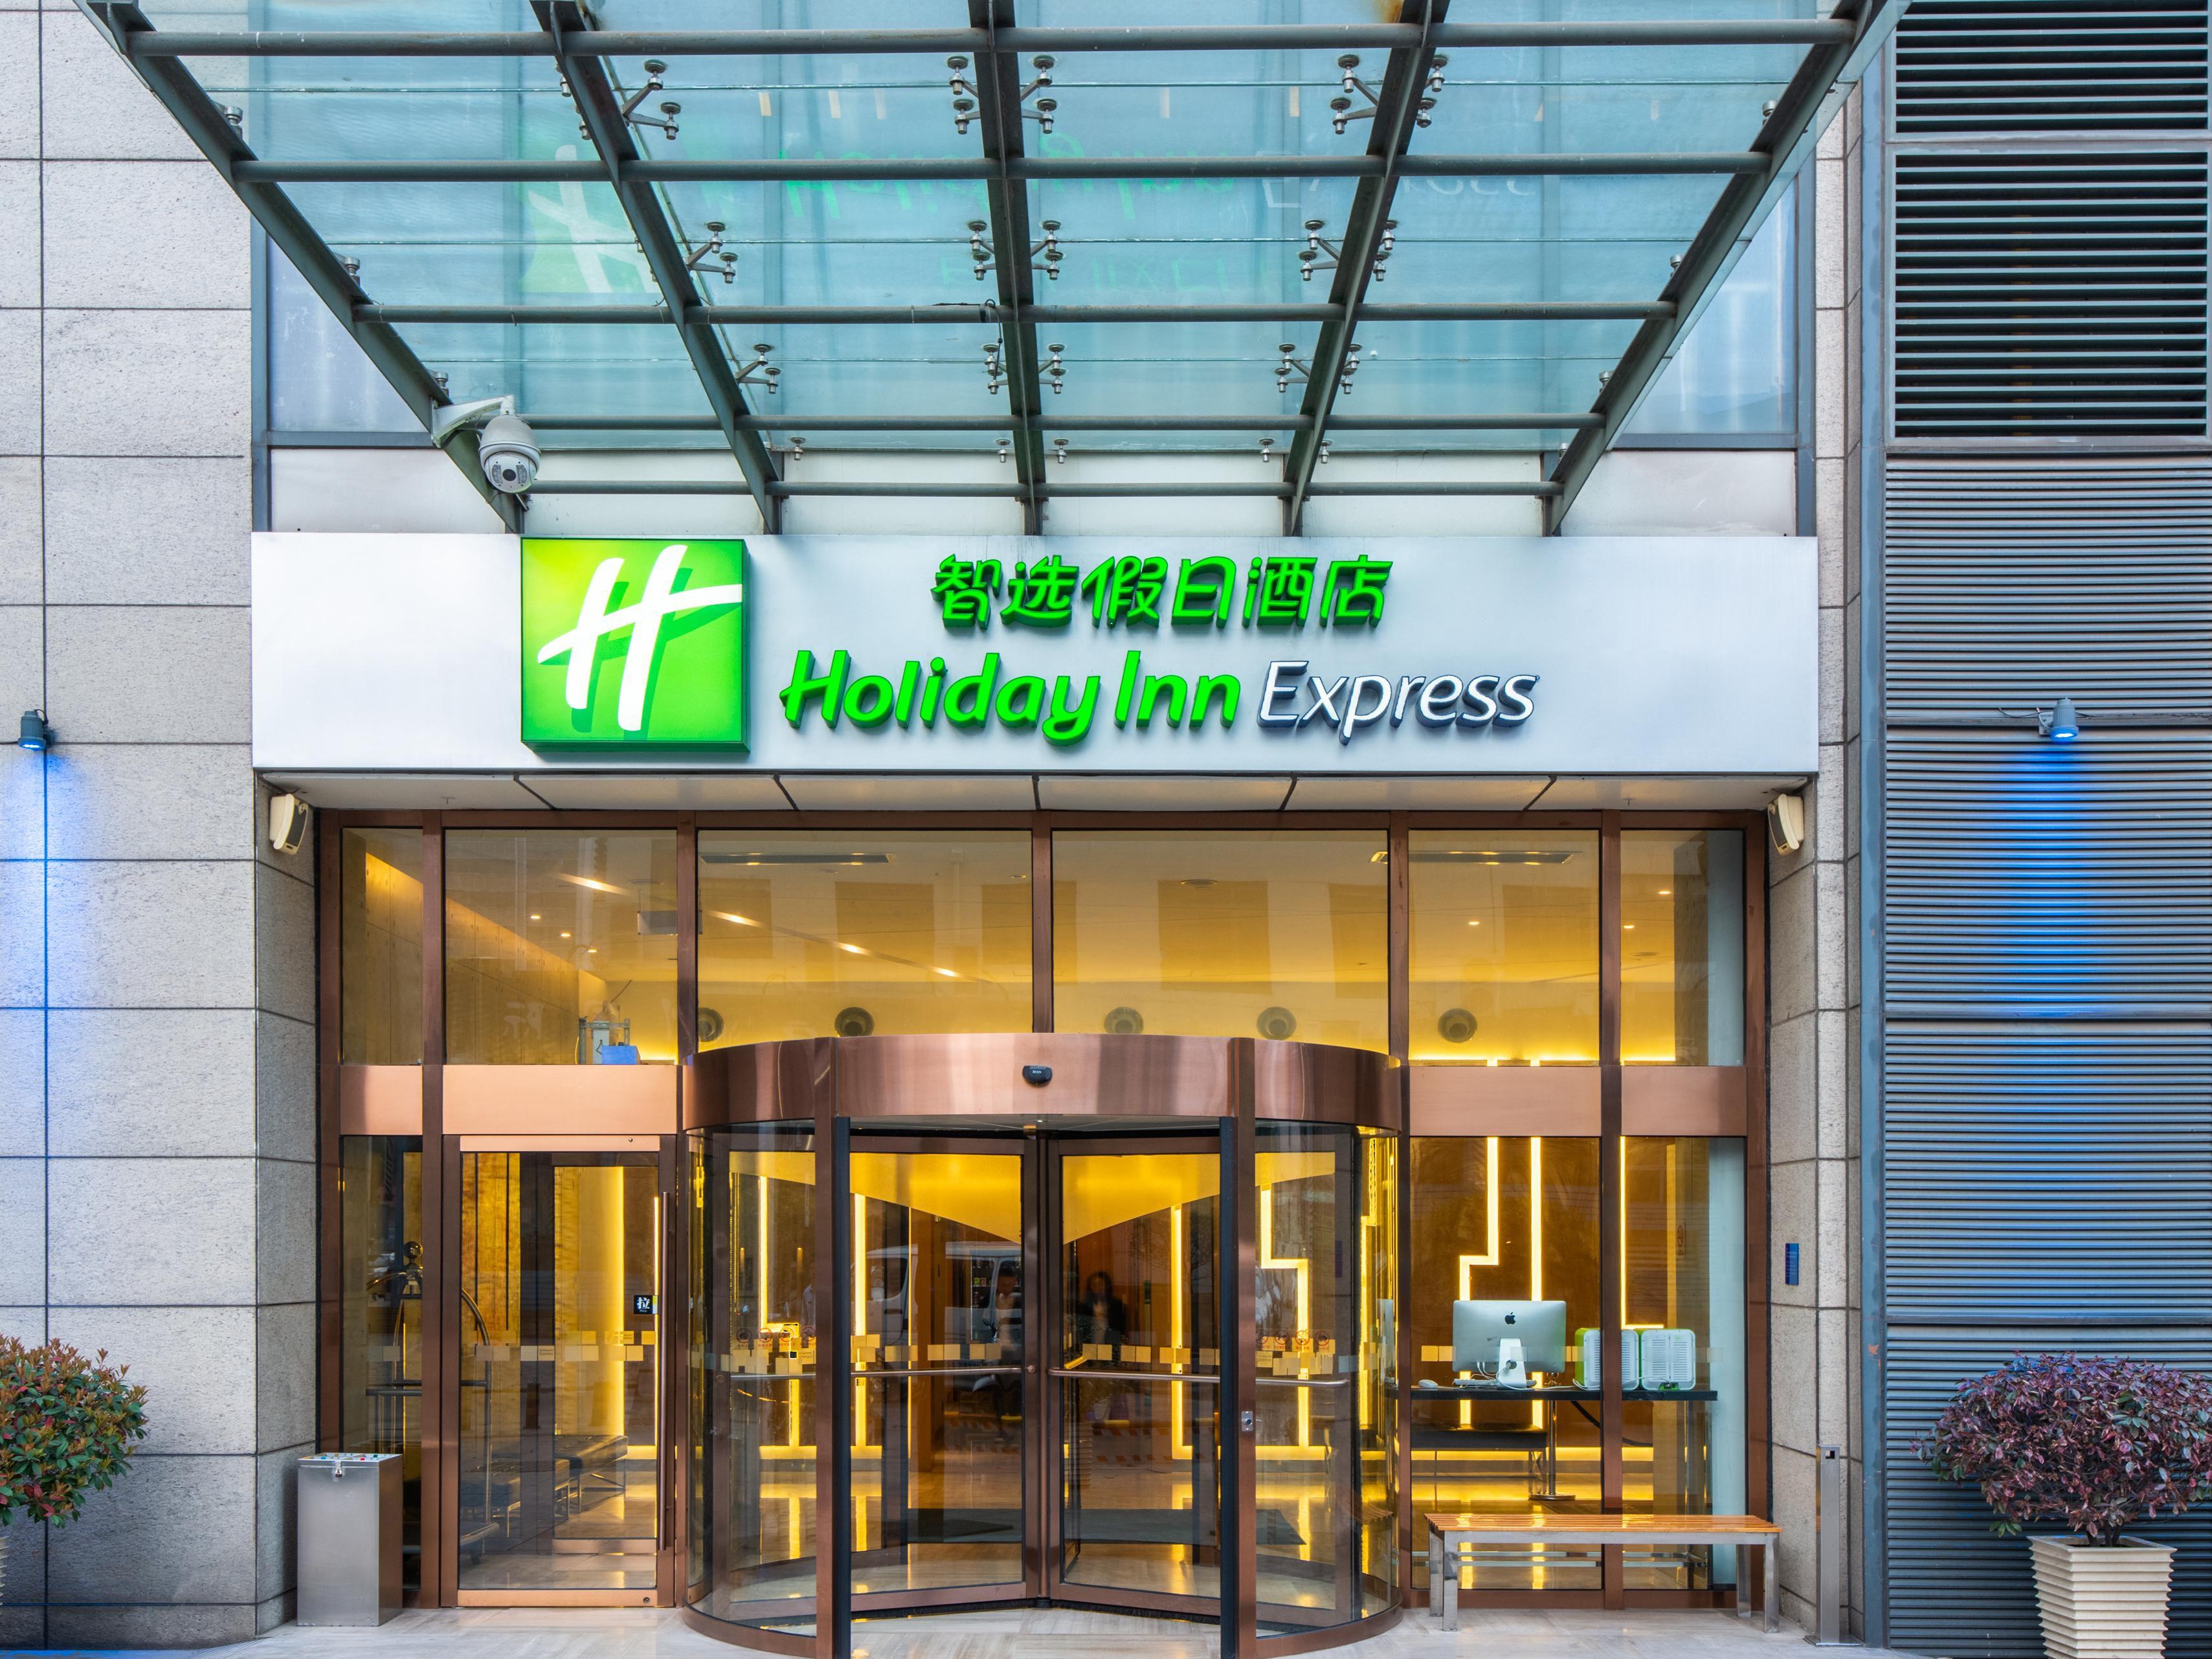 Holiday Inn Express 常州中心智選假日酒店 洲際酒店集團旗下酒店